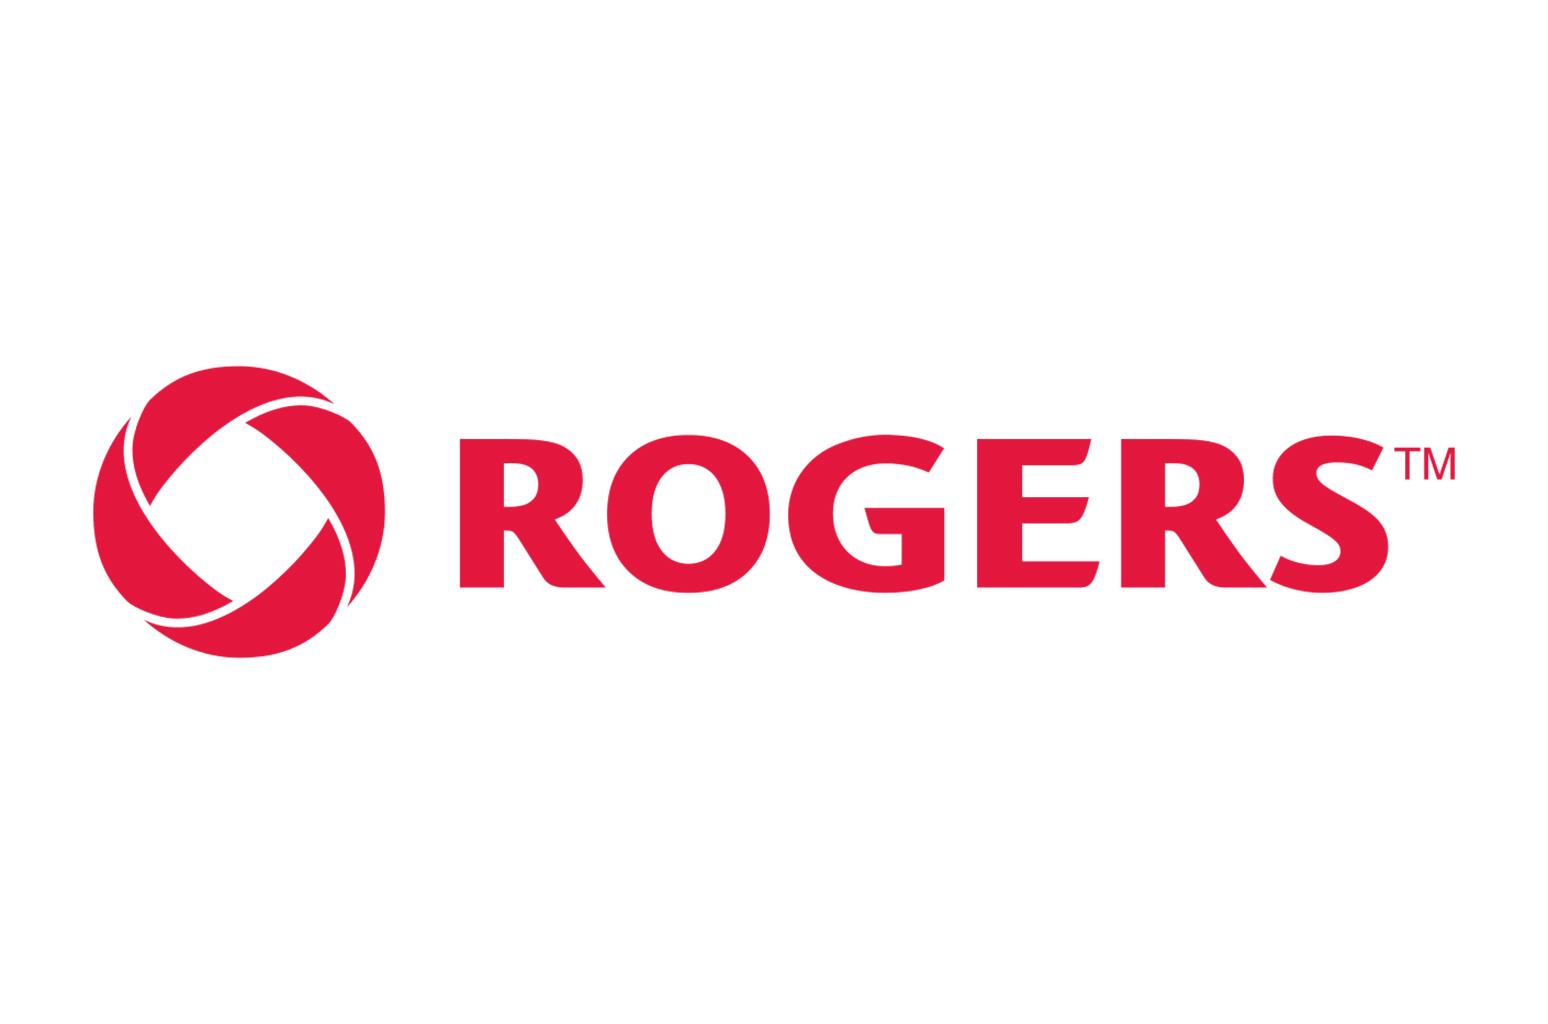 rogers-communications-logo-2017-billboard-1548.jpg